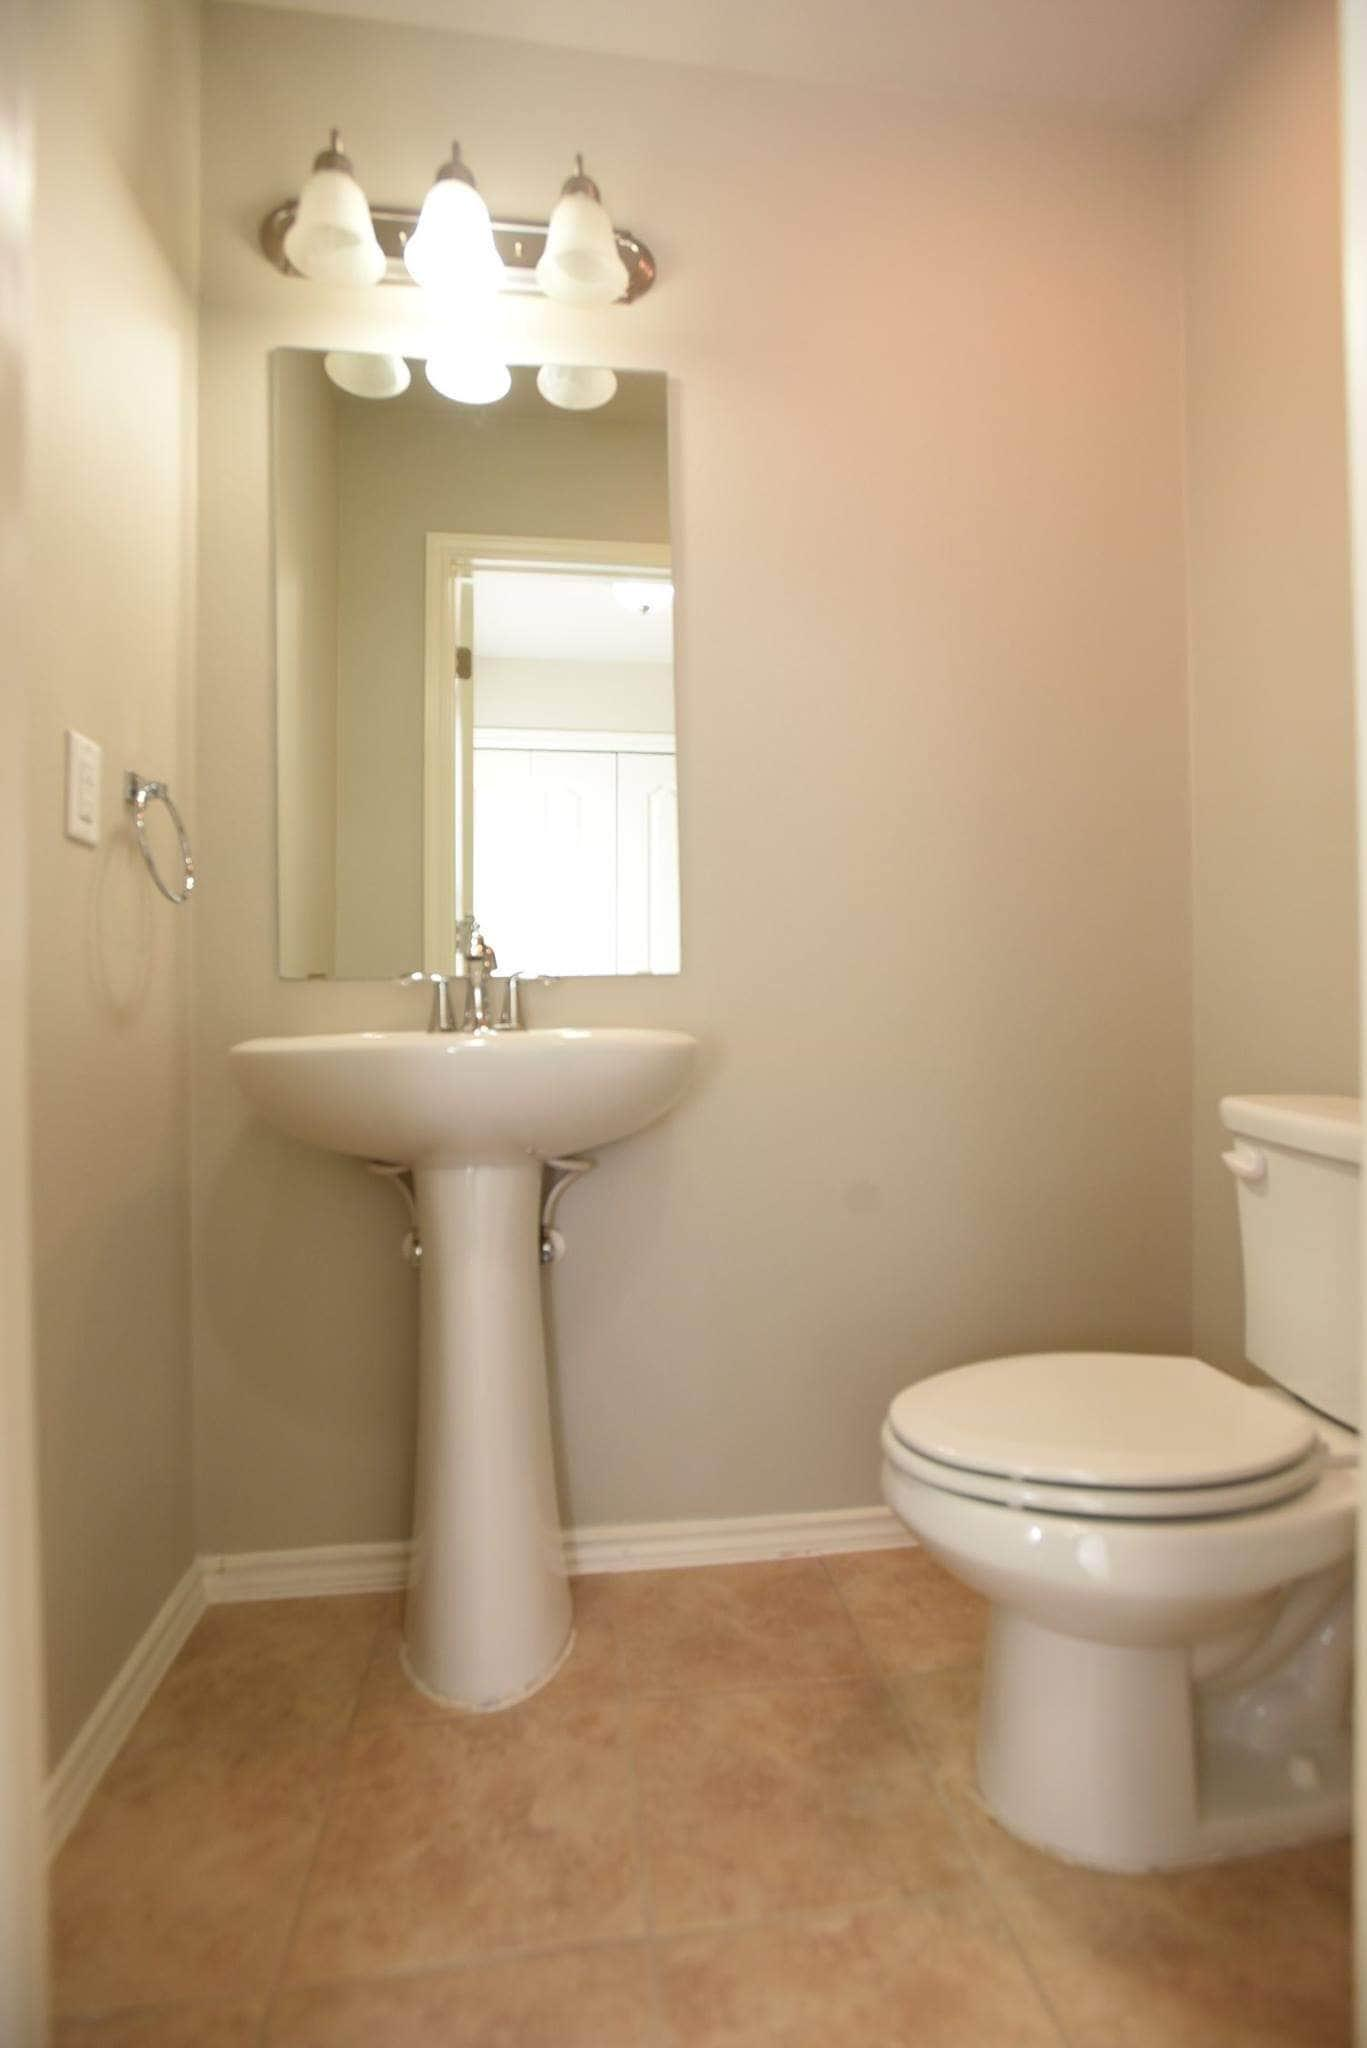 Bathroom featured in the Santa Elizabeth By WestWind Homes in Laredo, TX